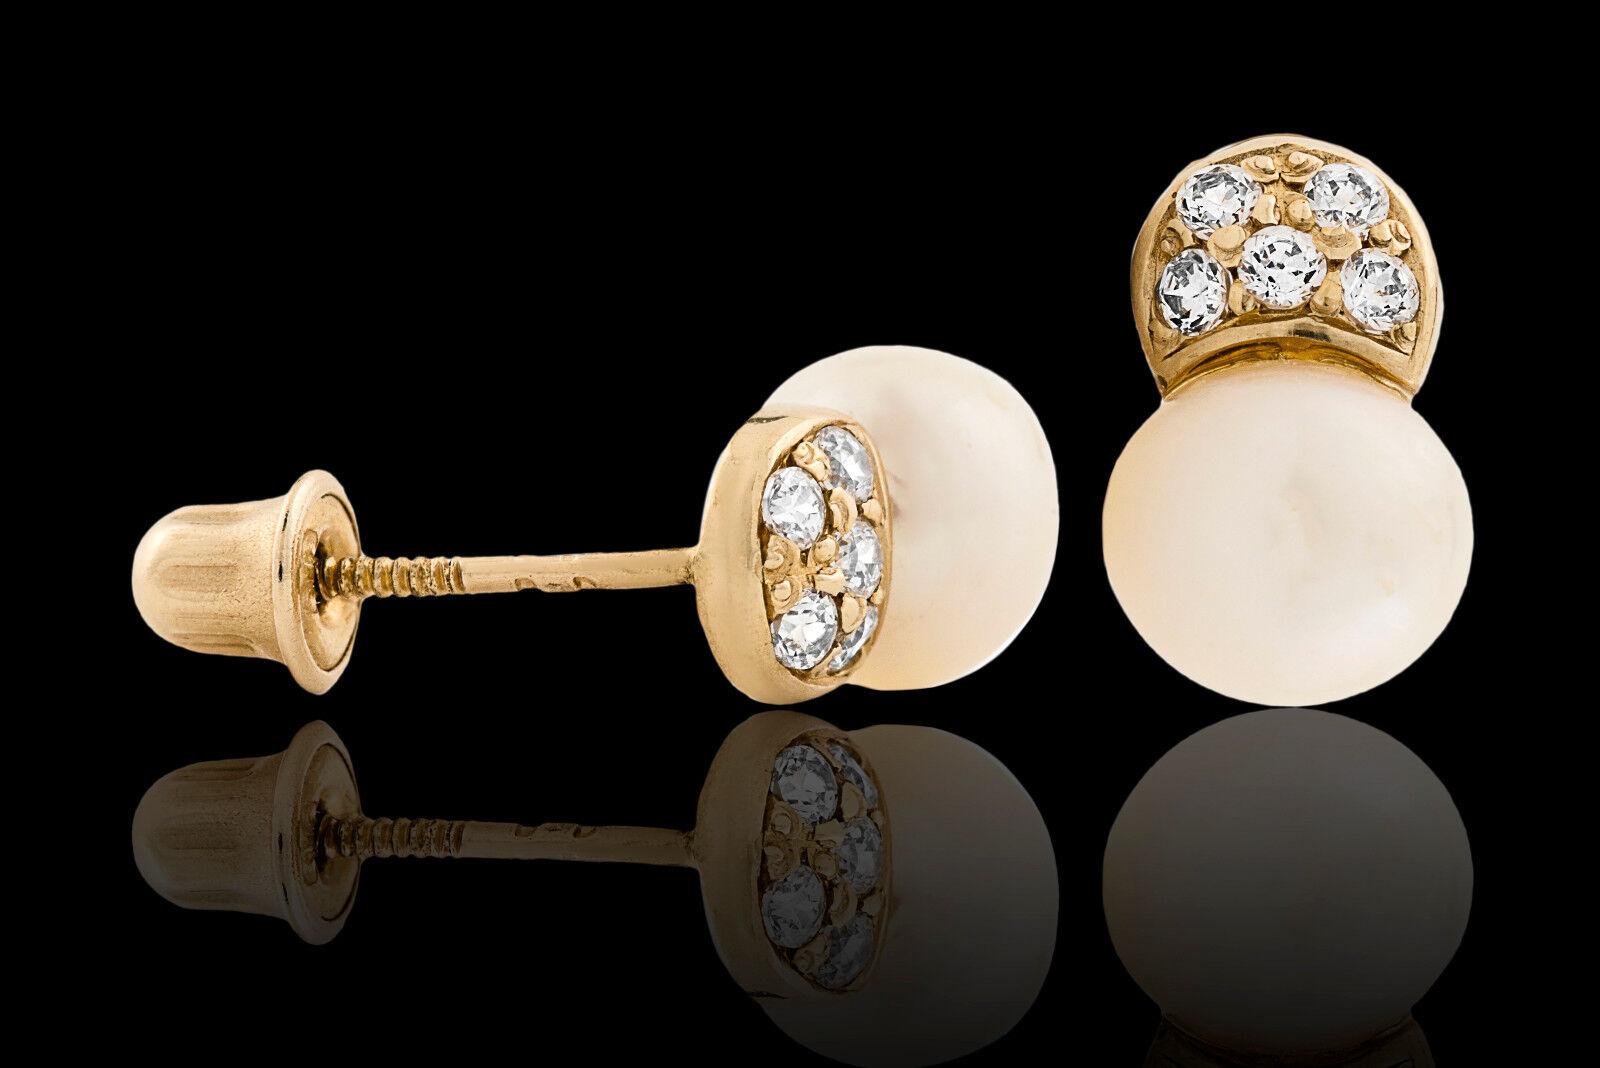 d73395c4ec825 Yellow 14K Micro Ball Pearl Genuine White Pave Box Gift w Earrings ...